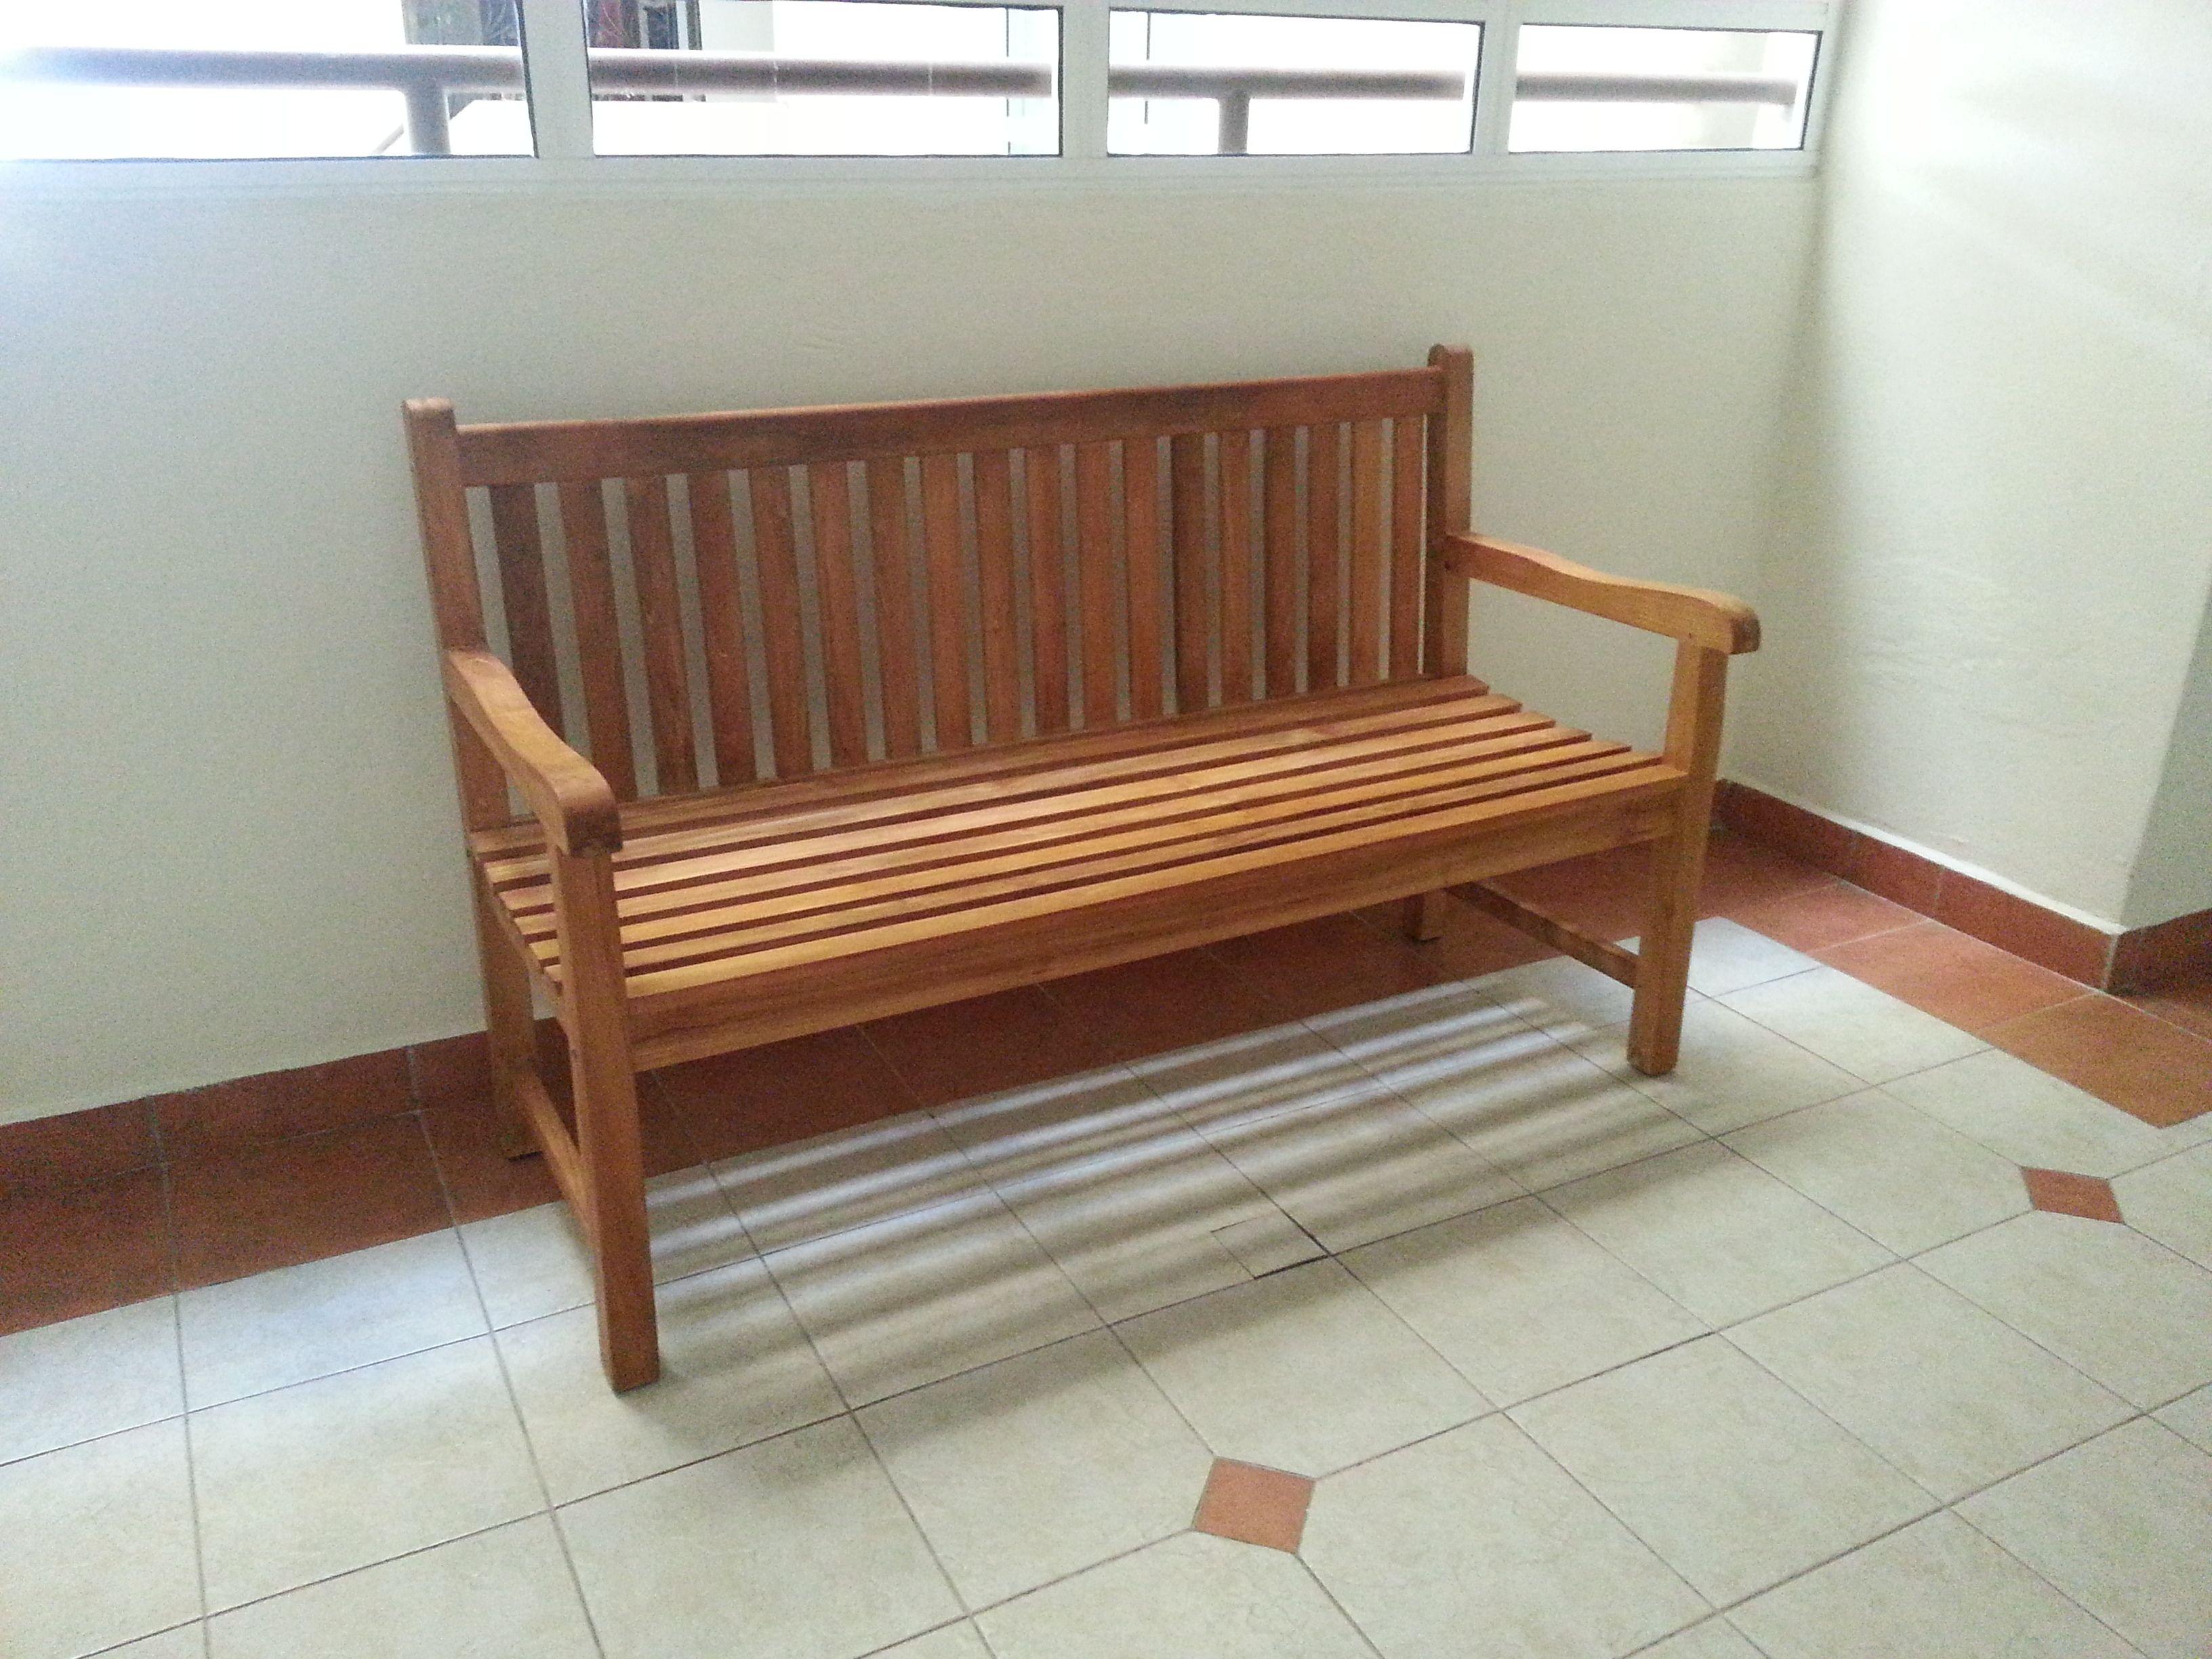 Teak Furniture Malaysia Teak Wood Furniture Shop Selangor Malaysia Teak Wood Furniture Teak Furniture At Home Furniture Store